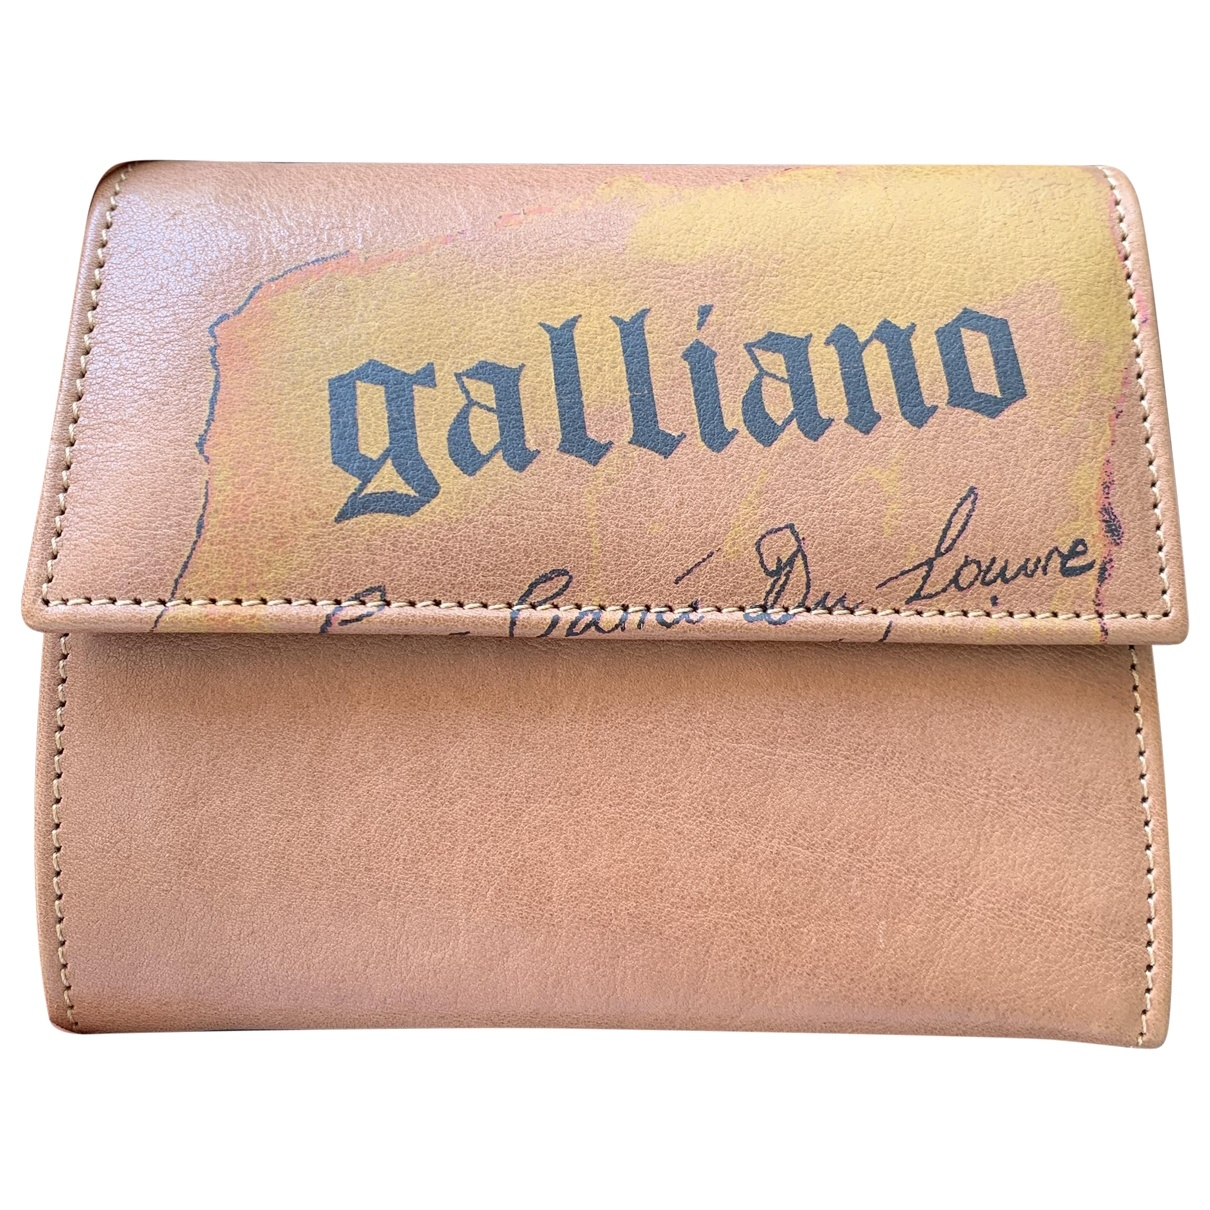 Galliano \N Leather wallet for Women \N